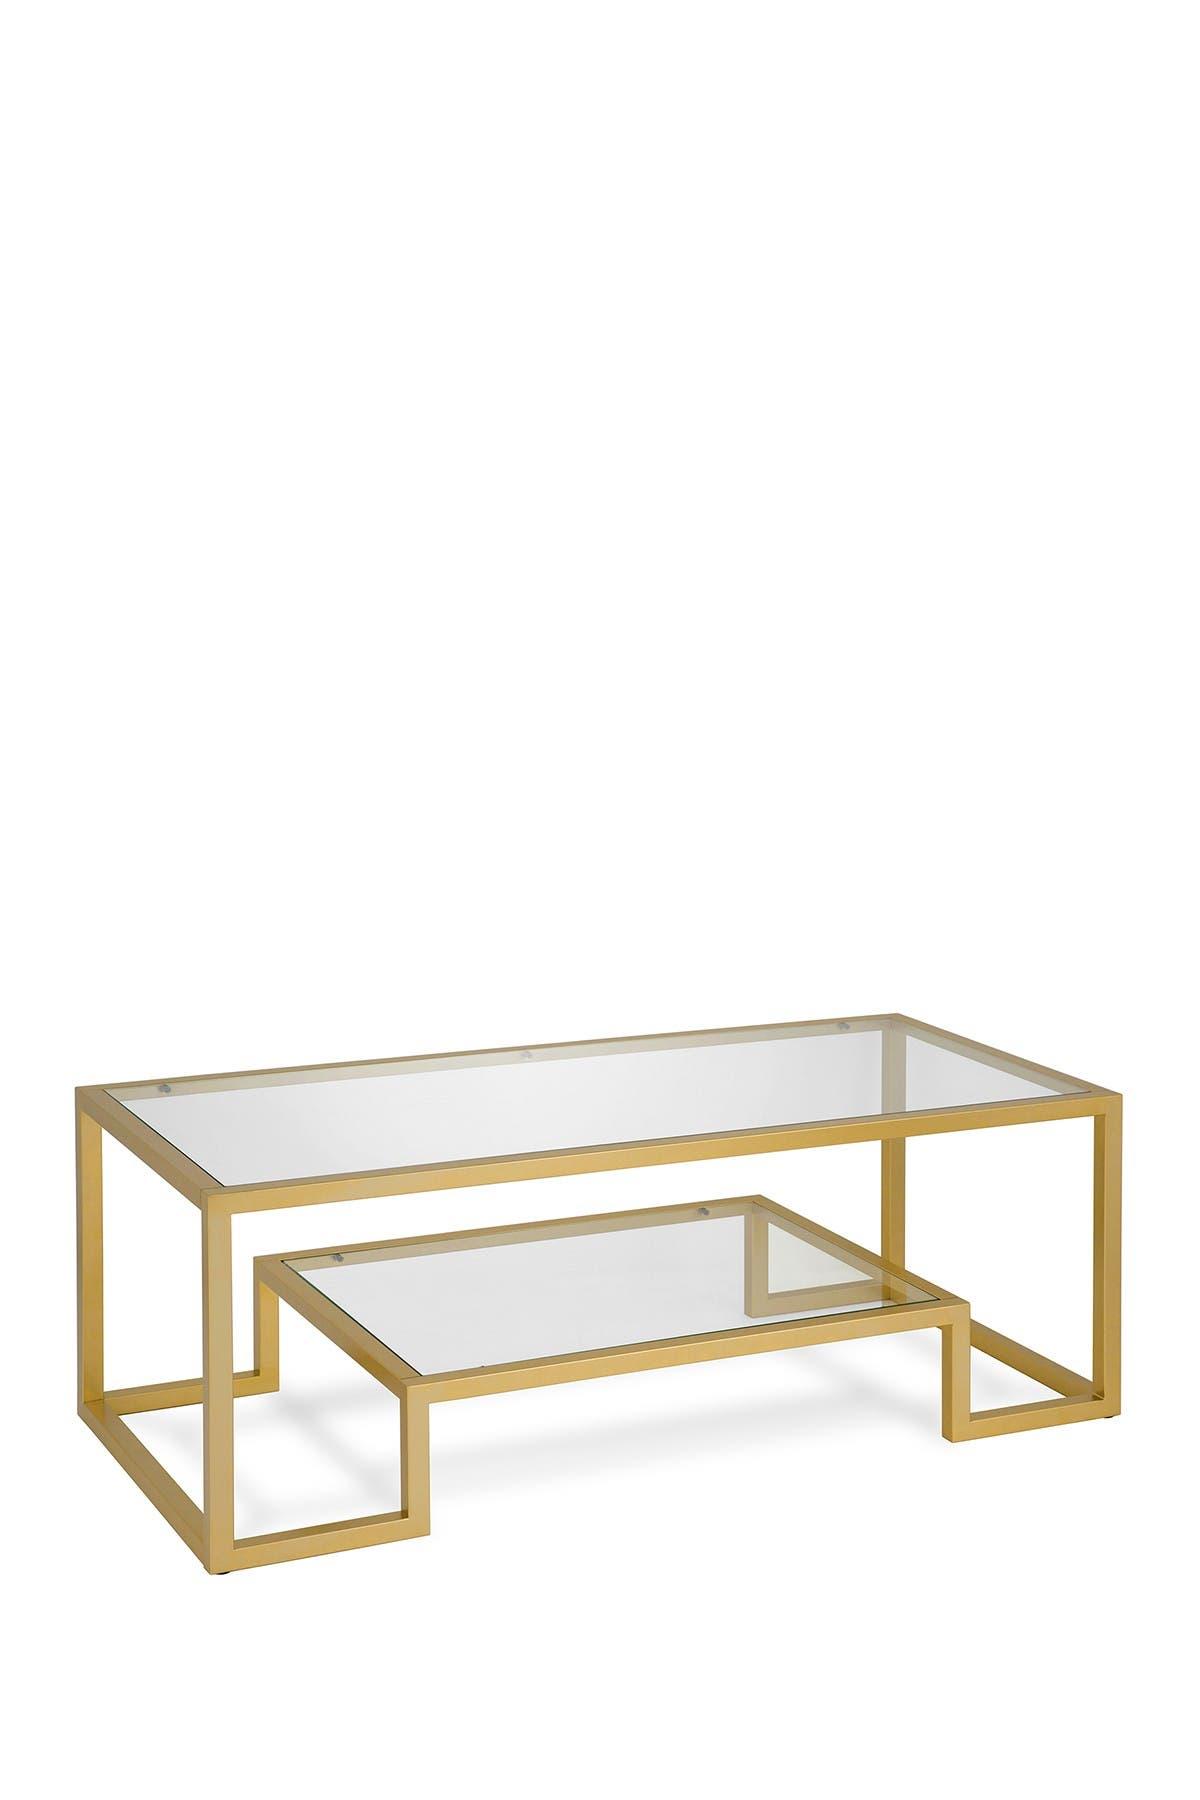 "Image of Addison and Lane Athena 45"" Brass Finish Coffee Table"